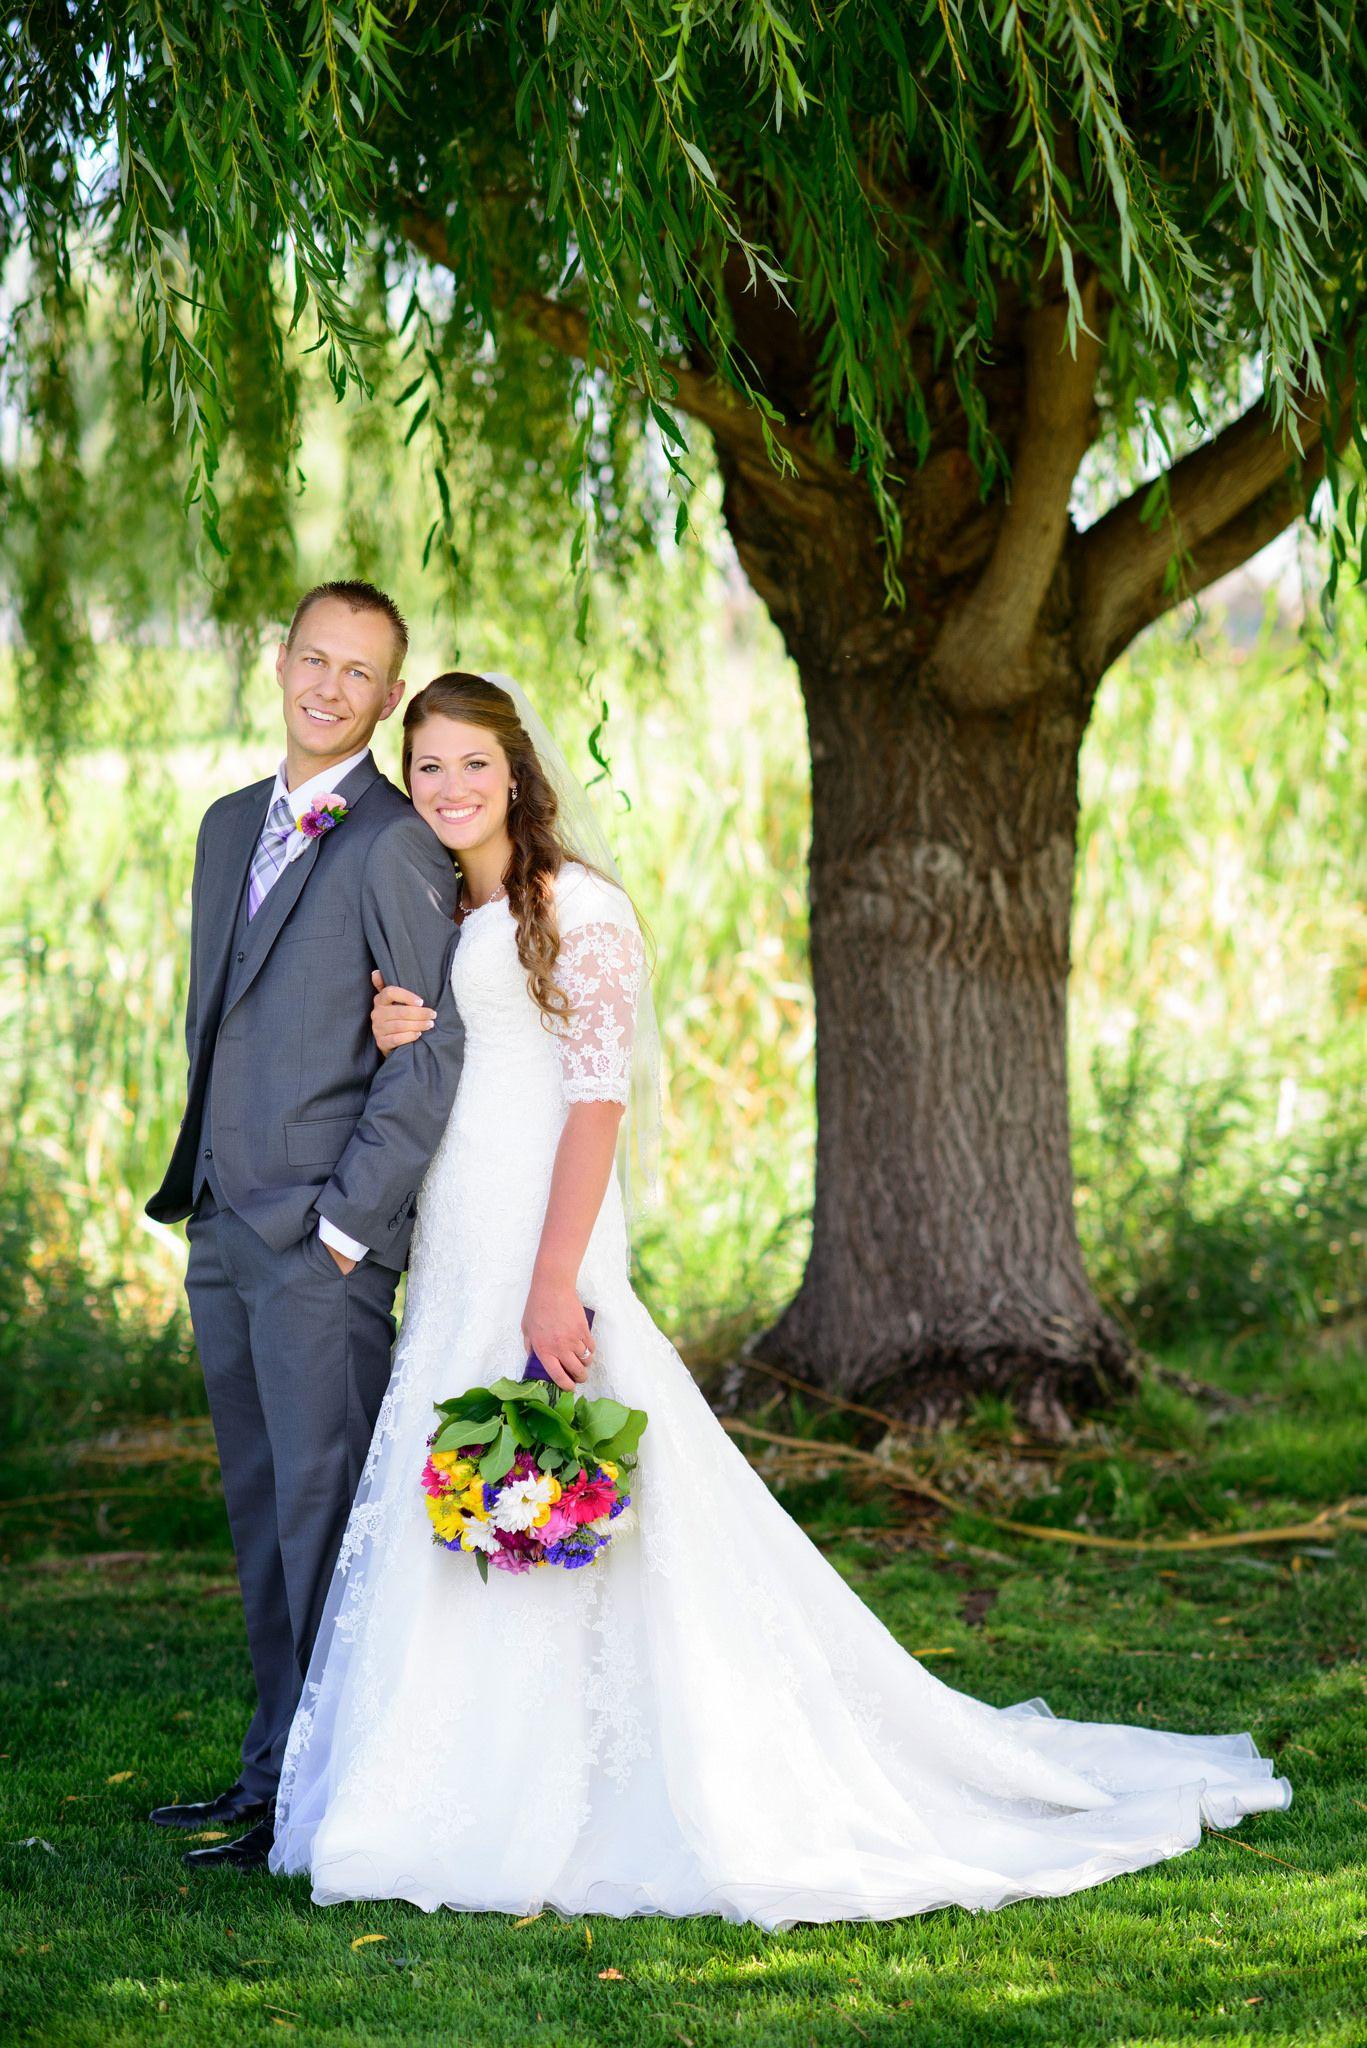 kel22 Wedding photography poses, Utah wedding